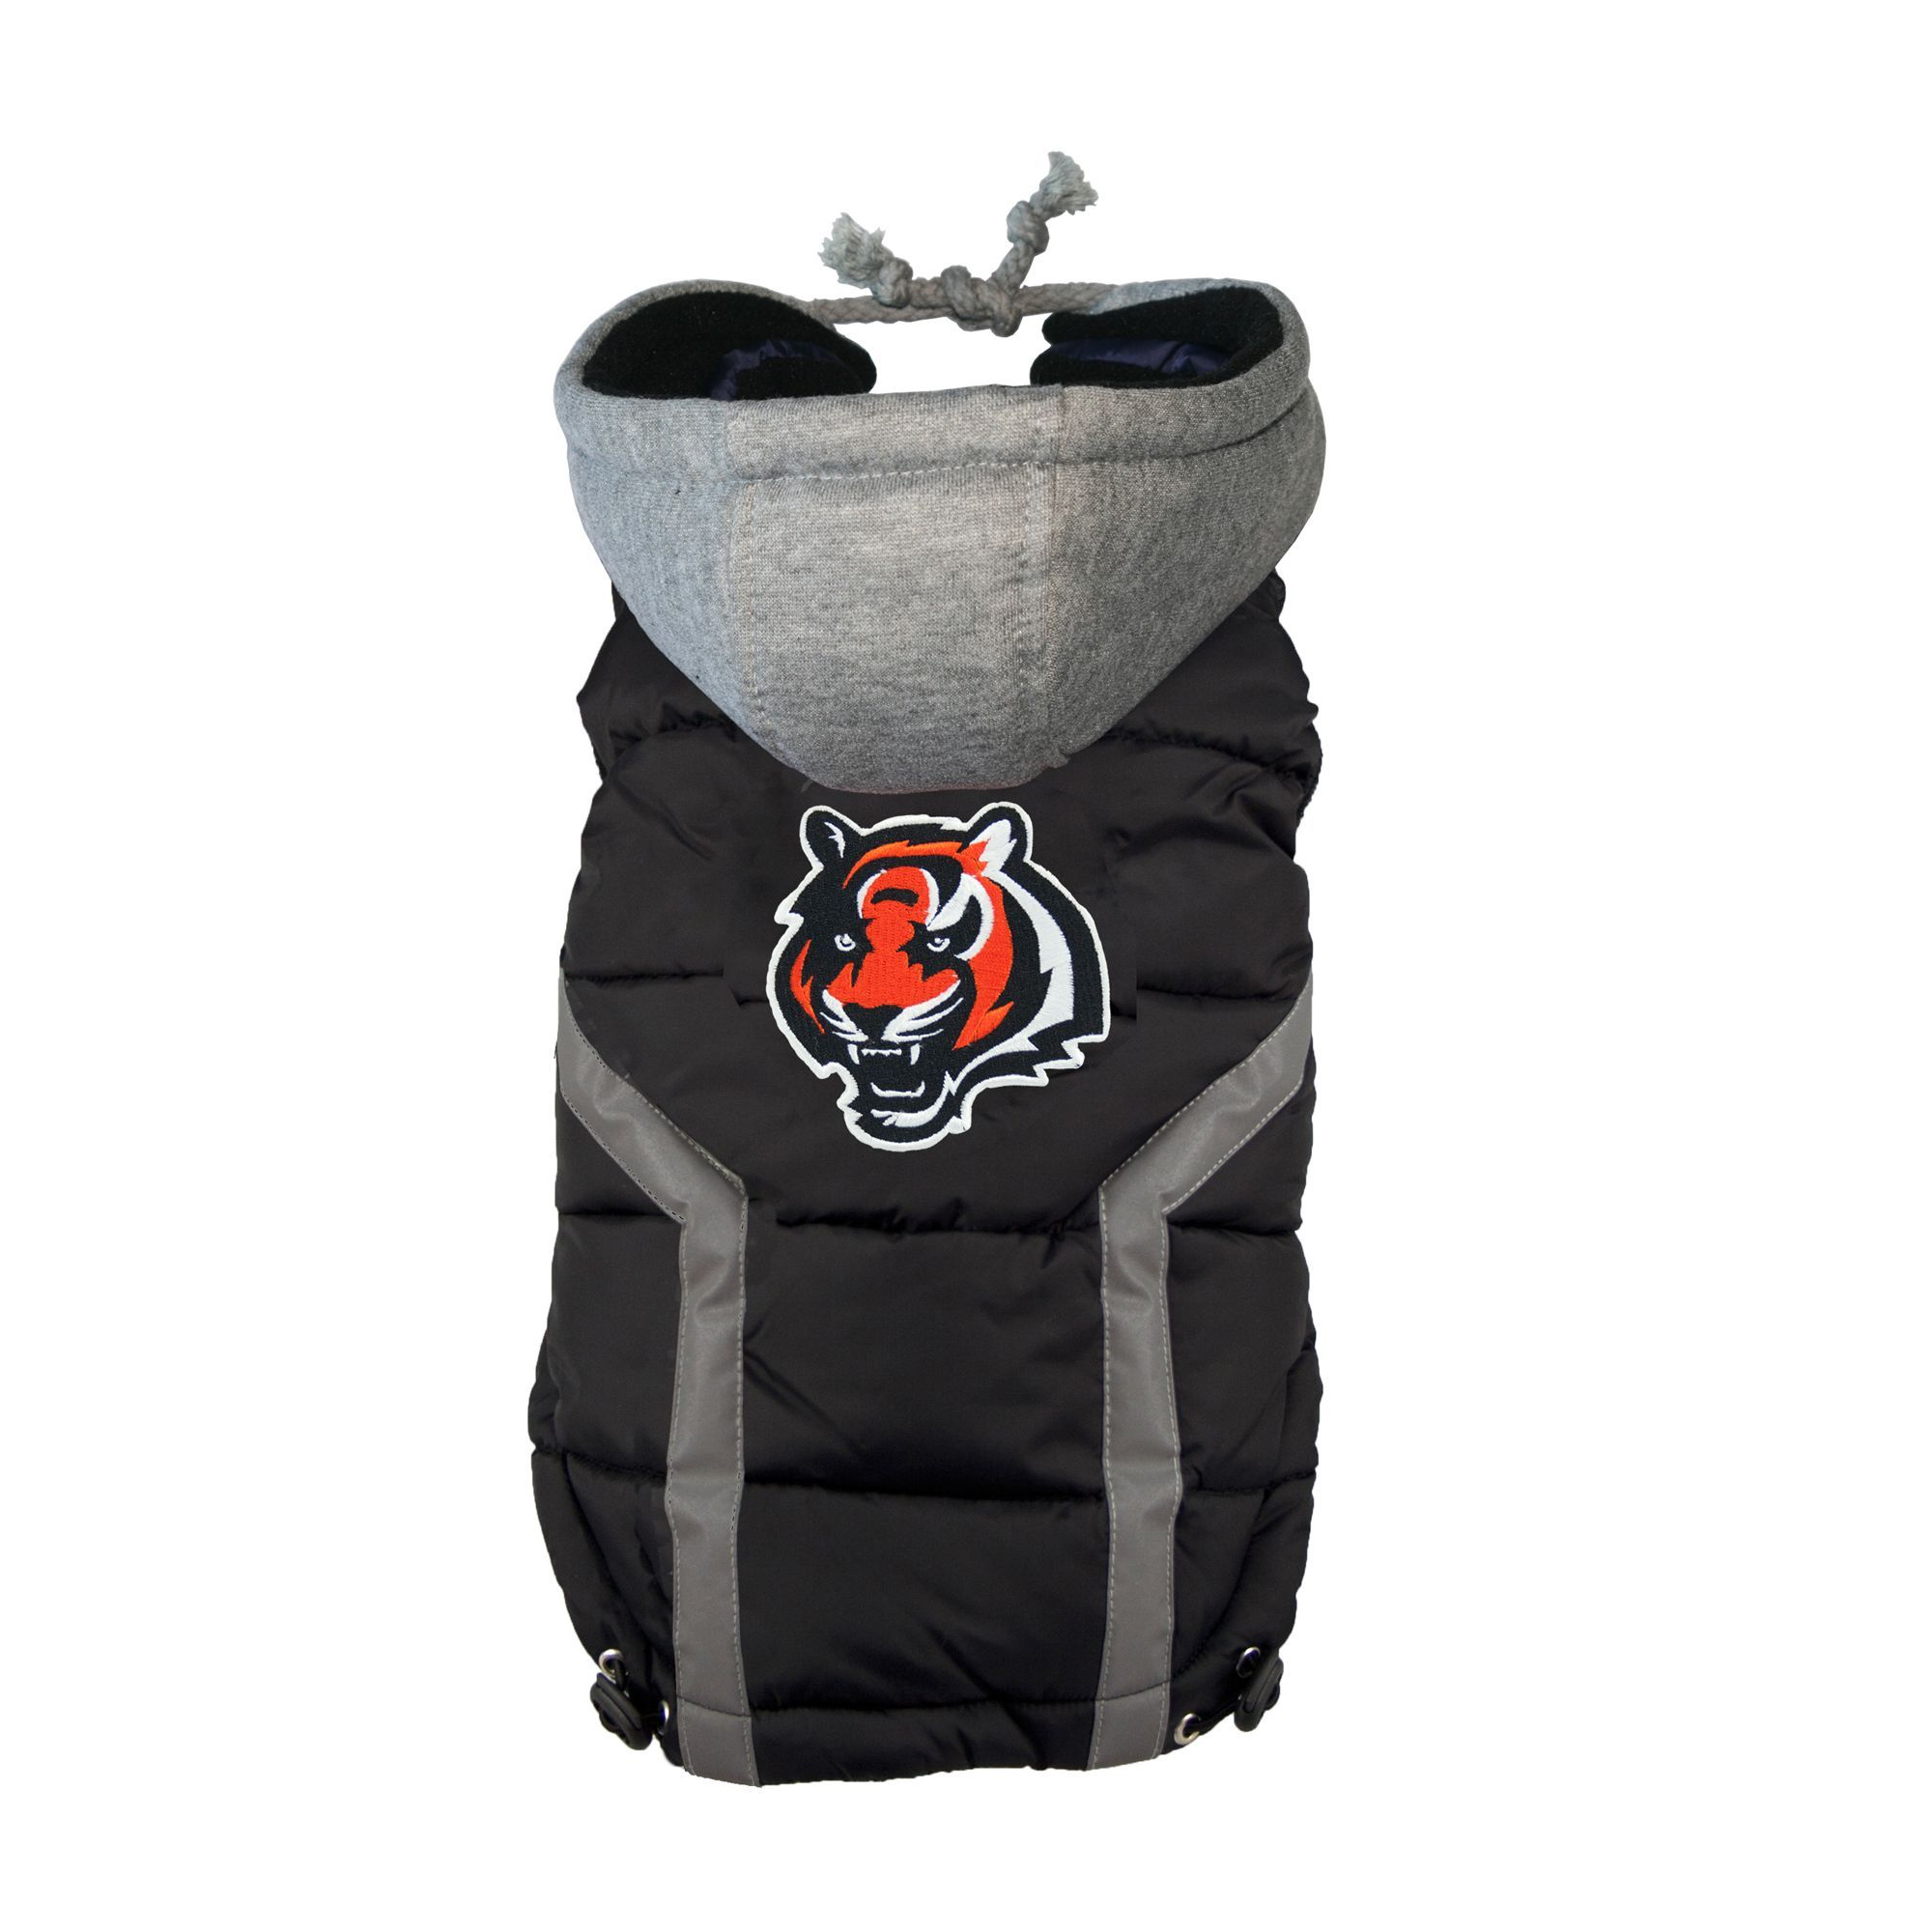 Cincinnati Bengals NFL Puffer Vest size 2X Large, Hip